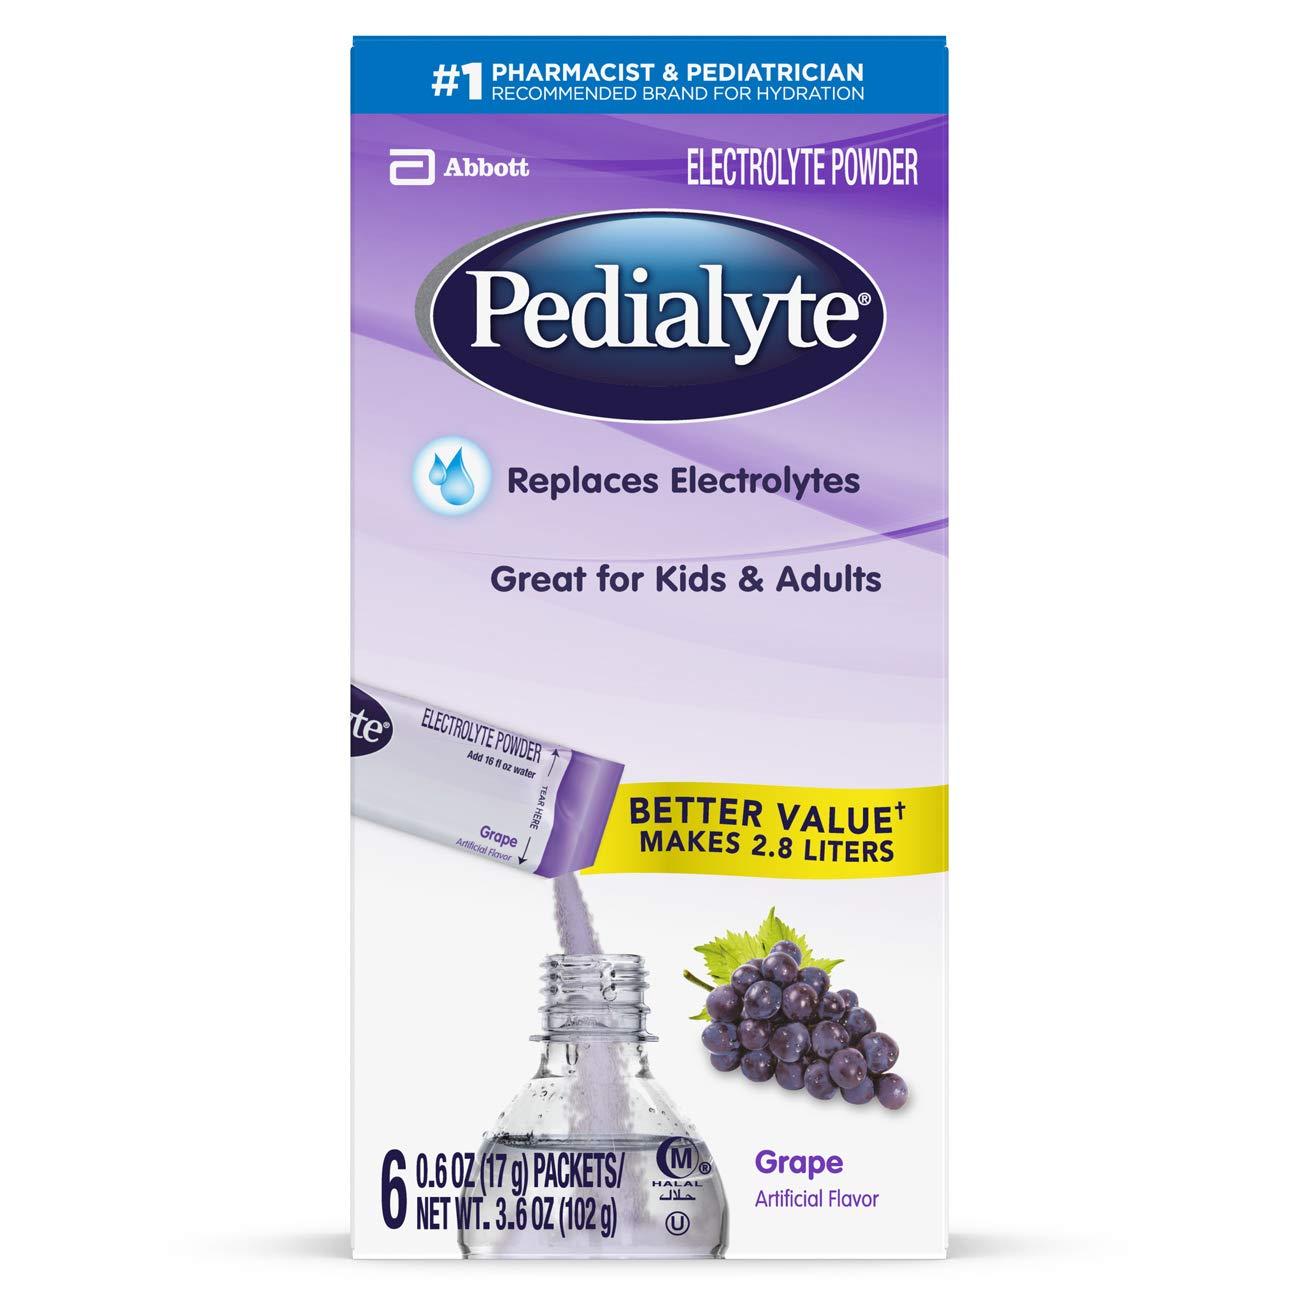 Pedialyte Electrolyte Powder, Grape, Electrolyte Hydration Drink, 0.6 oz Powder Packs, 6 Count